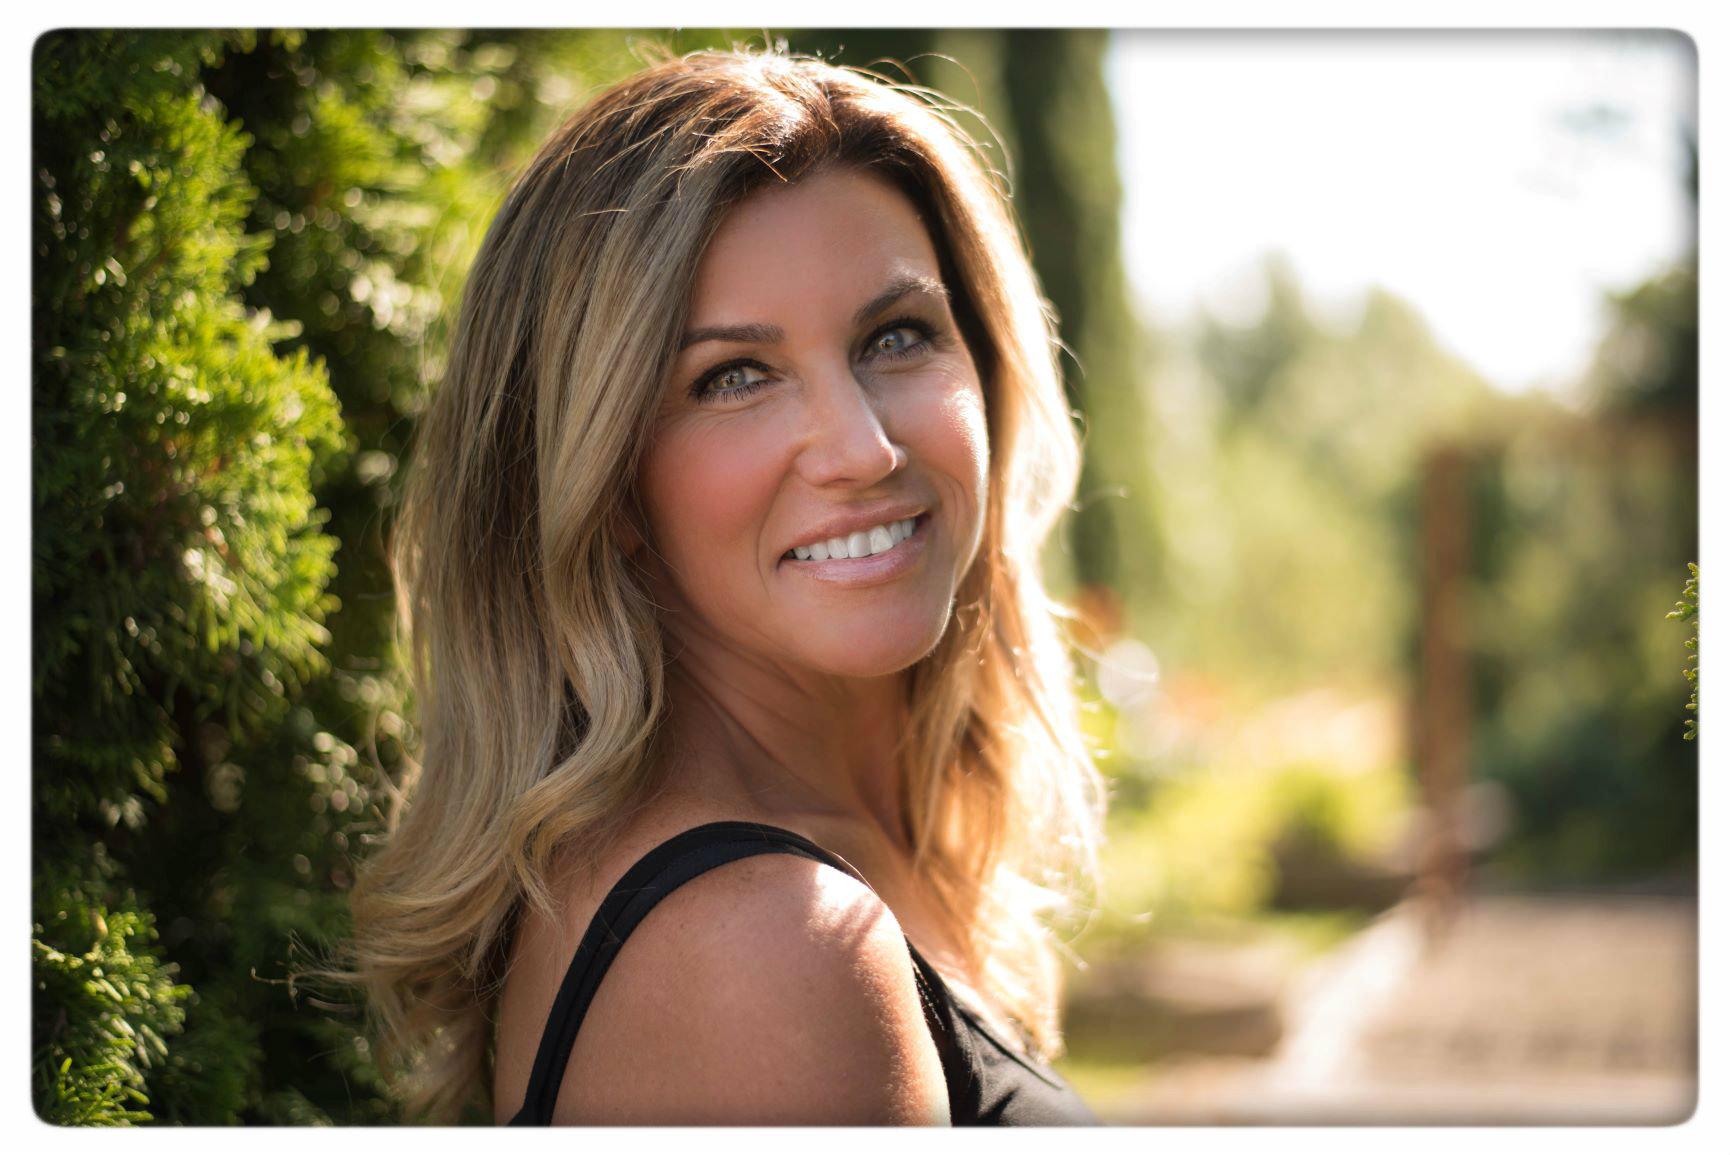 North Idaho Realtor Lauren Adair